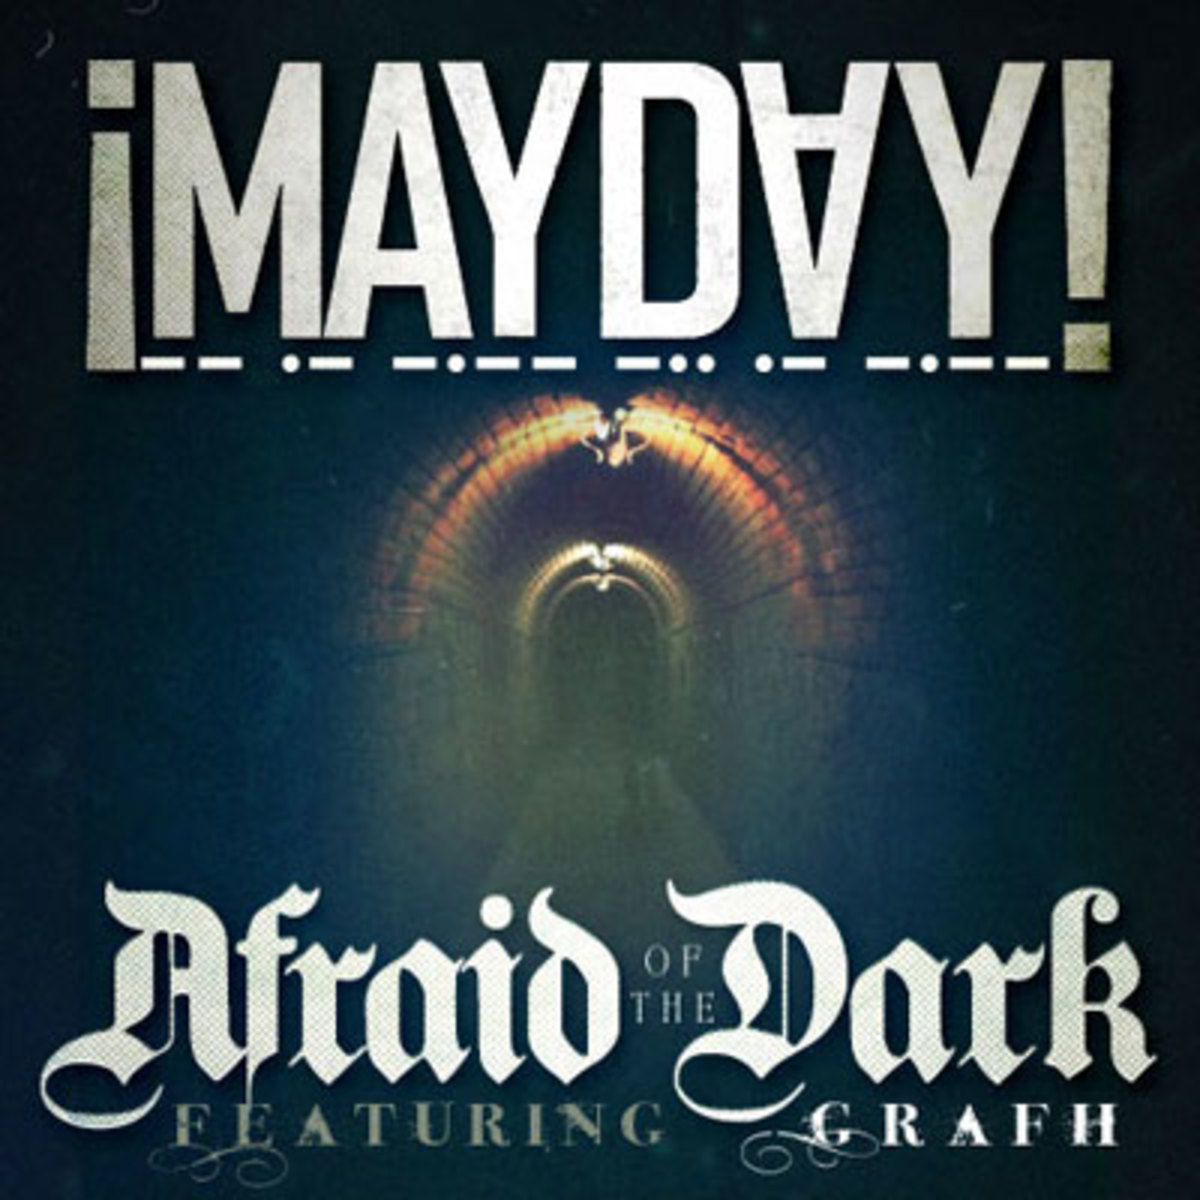 mayday-afraidofthedark.jpg